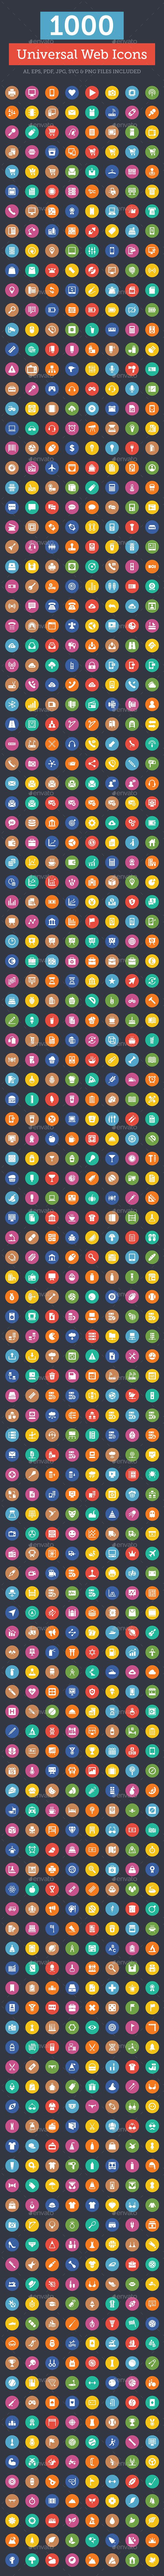 1000+ Universal Web Icons - Web Icons